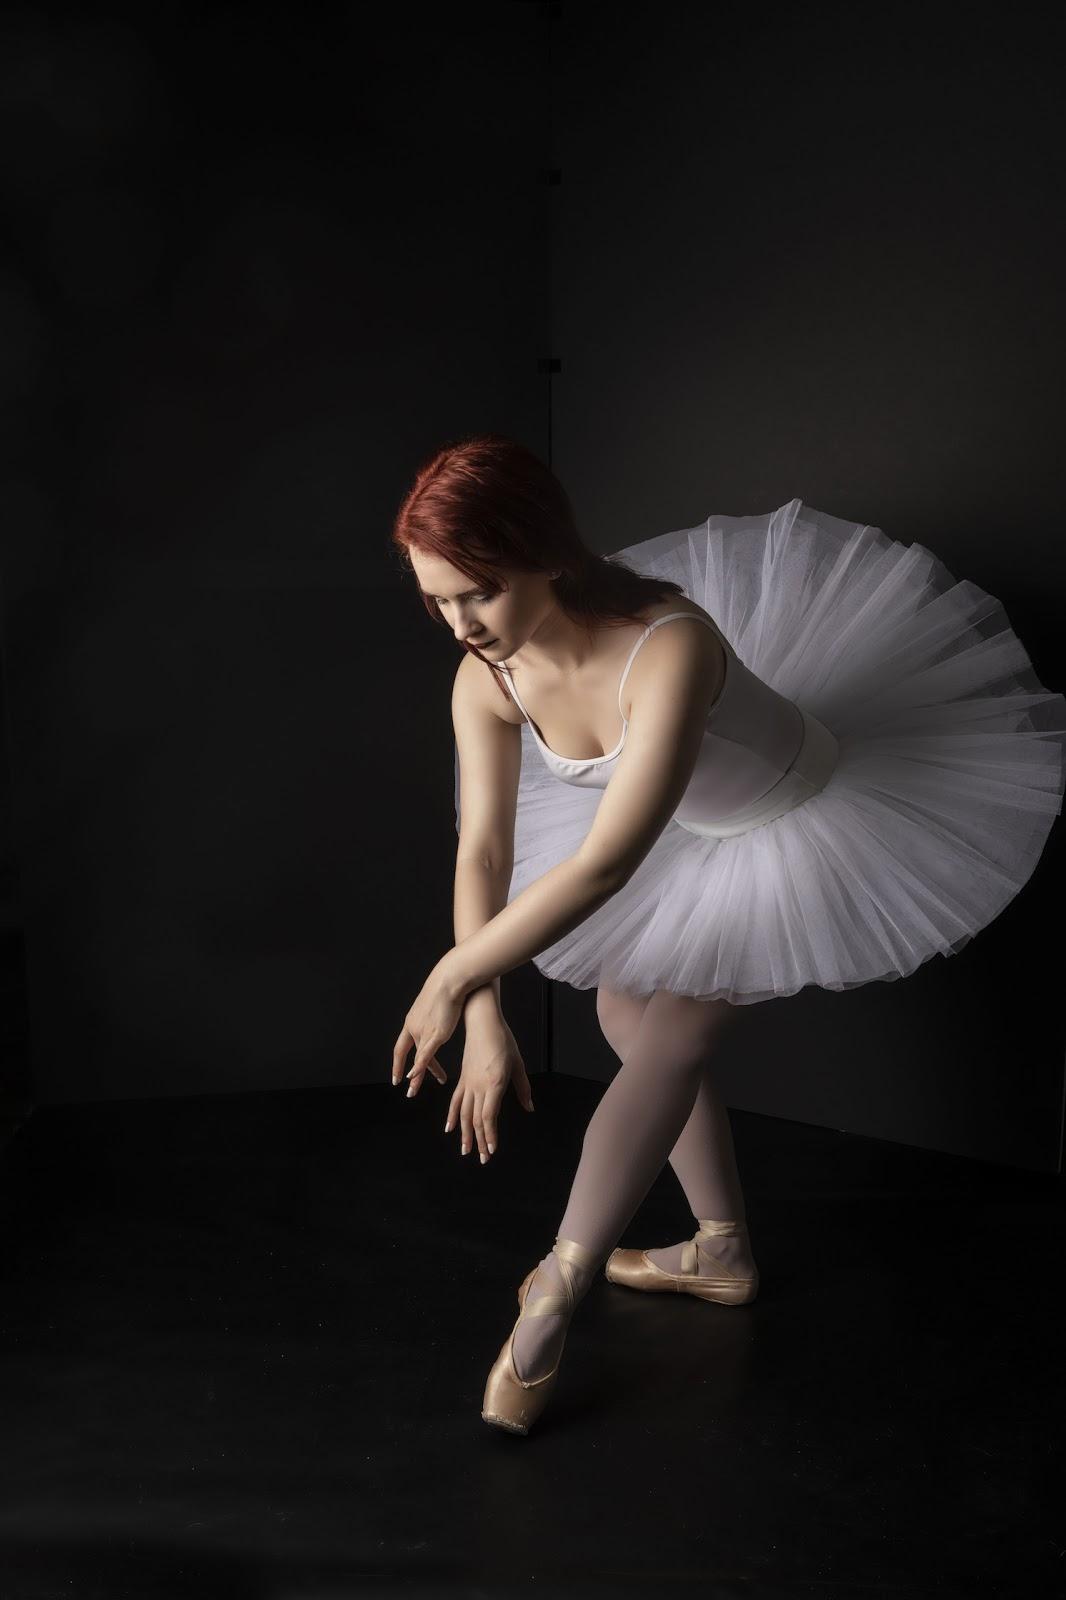 Susanna Wesson